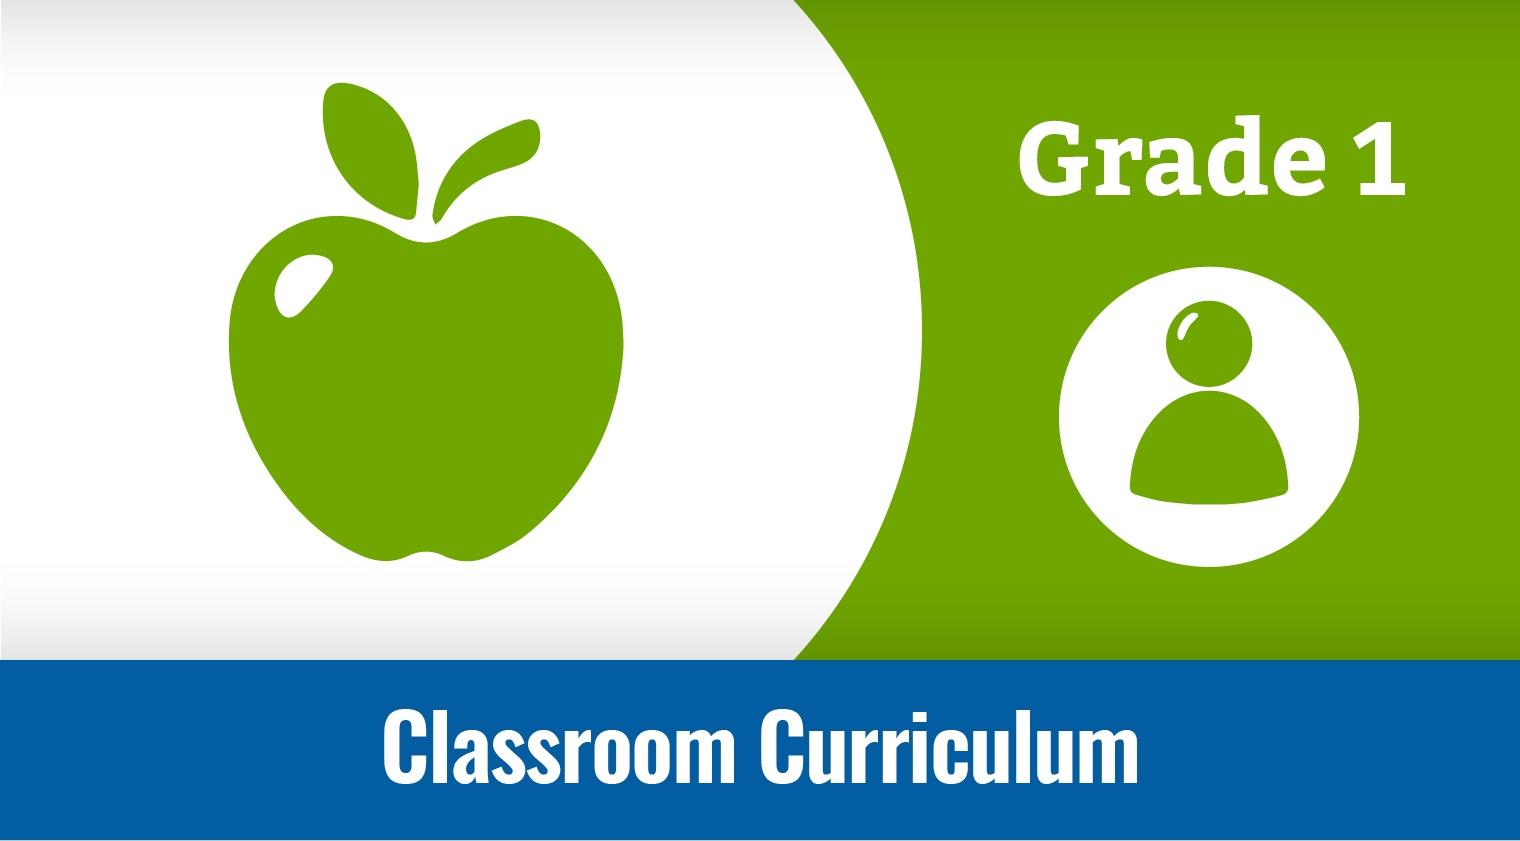 Grade 1 Classroom Curriculum - Hooray for Health!